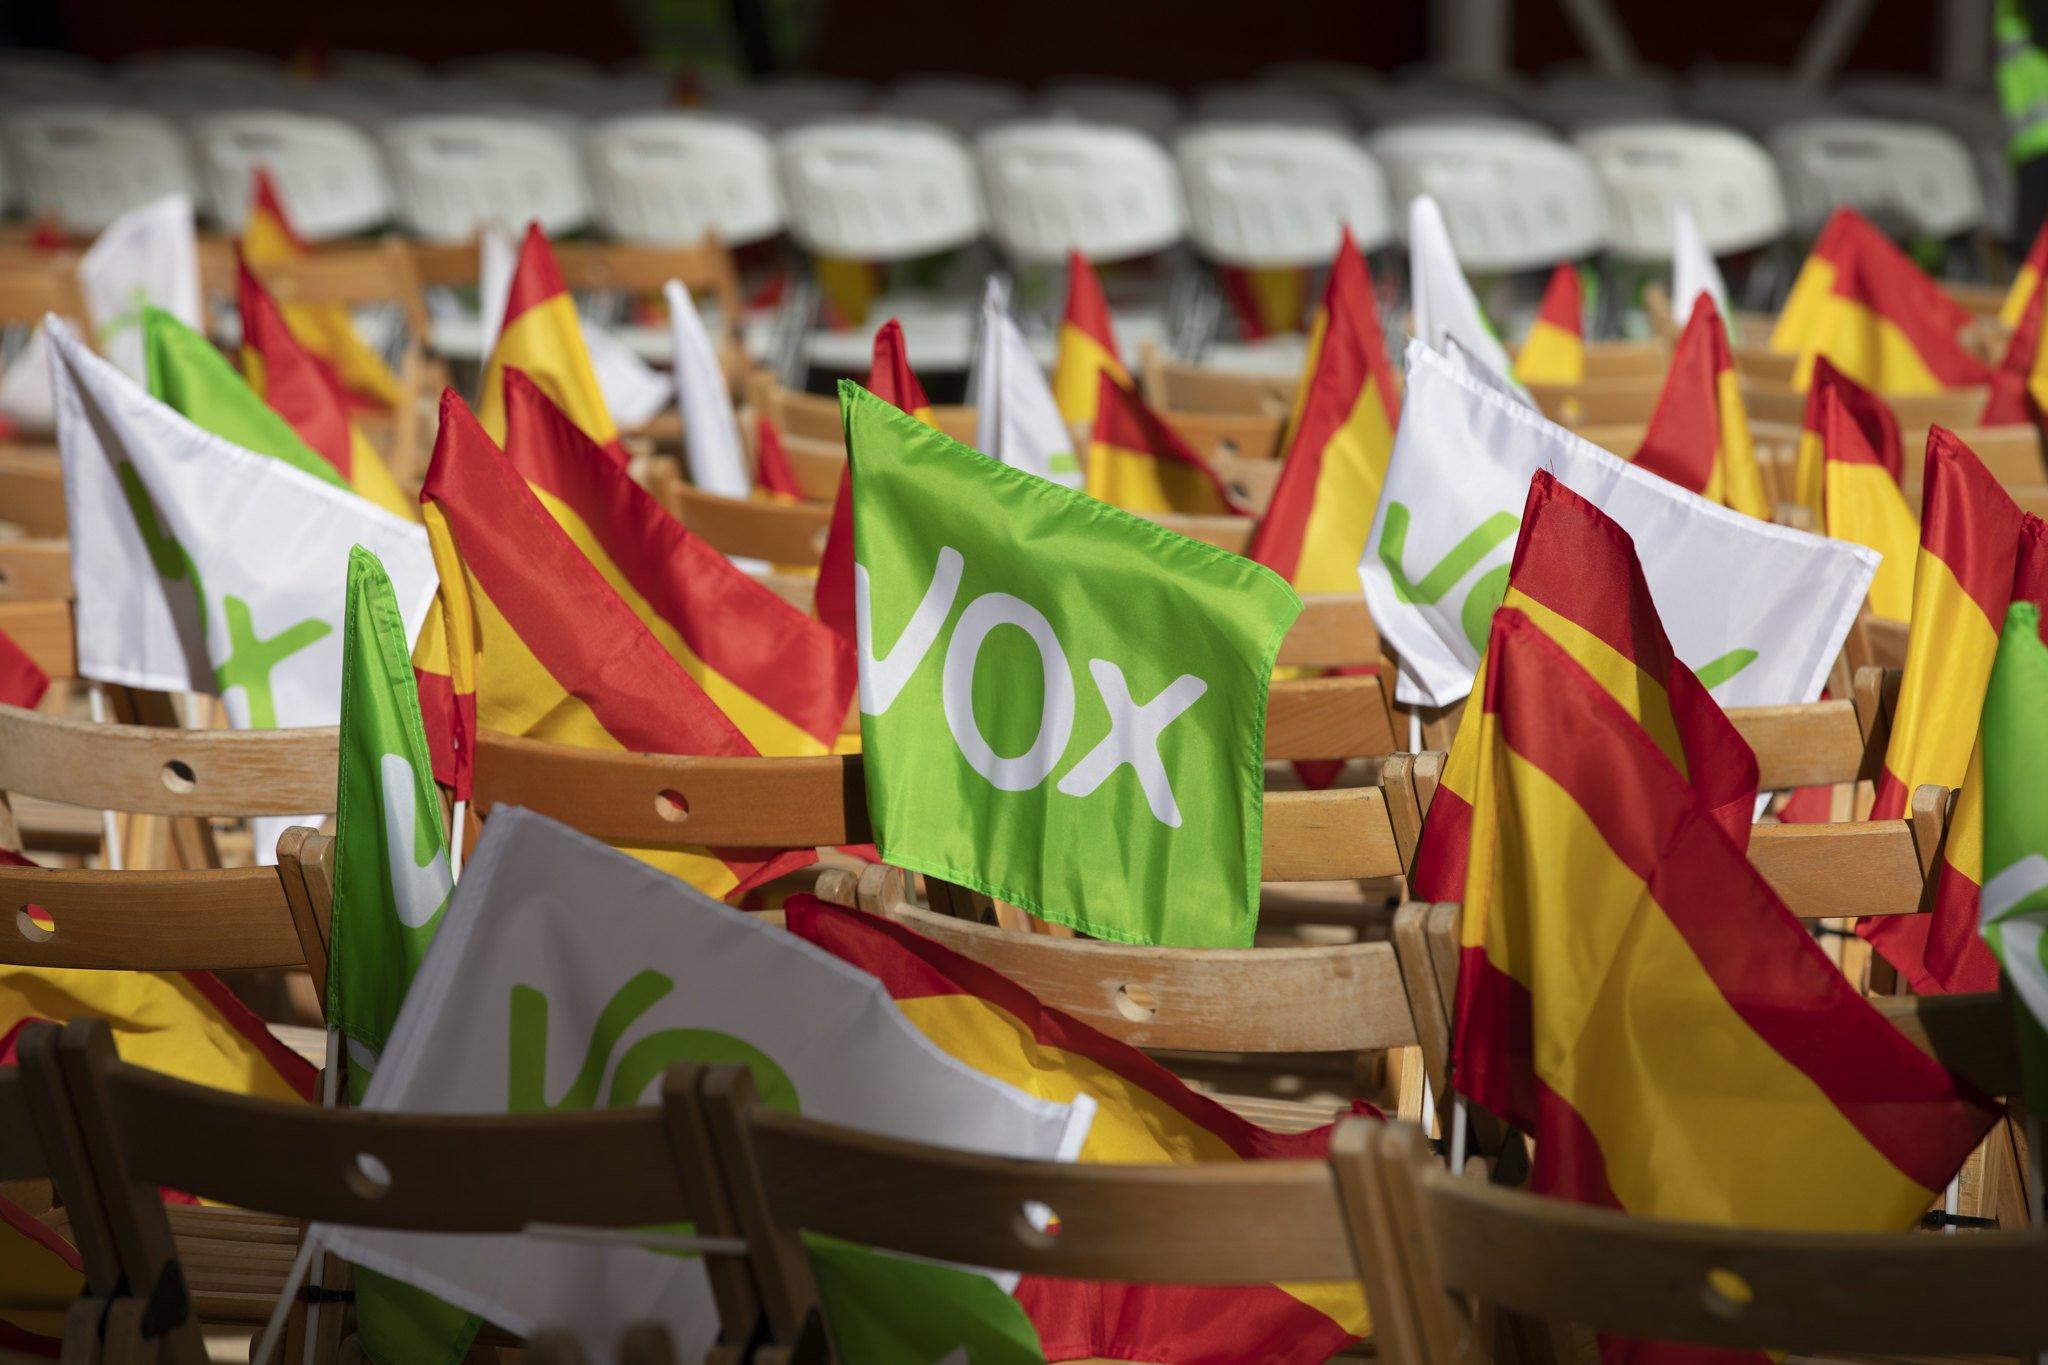 Vox, a favor de la legítima defensa